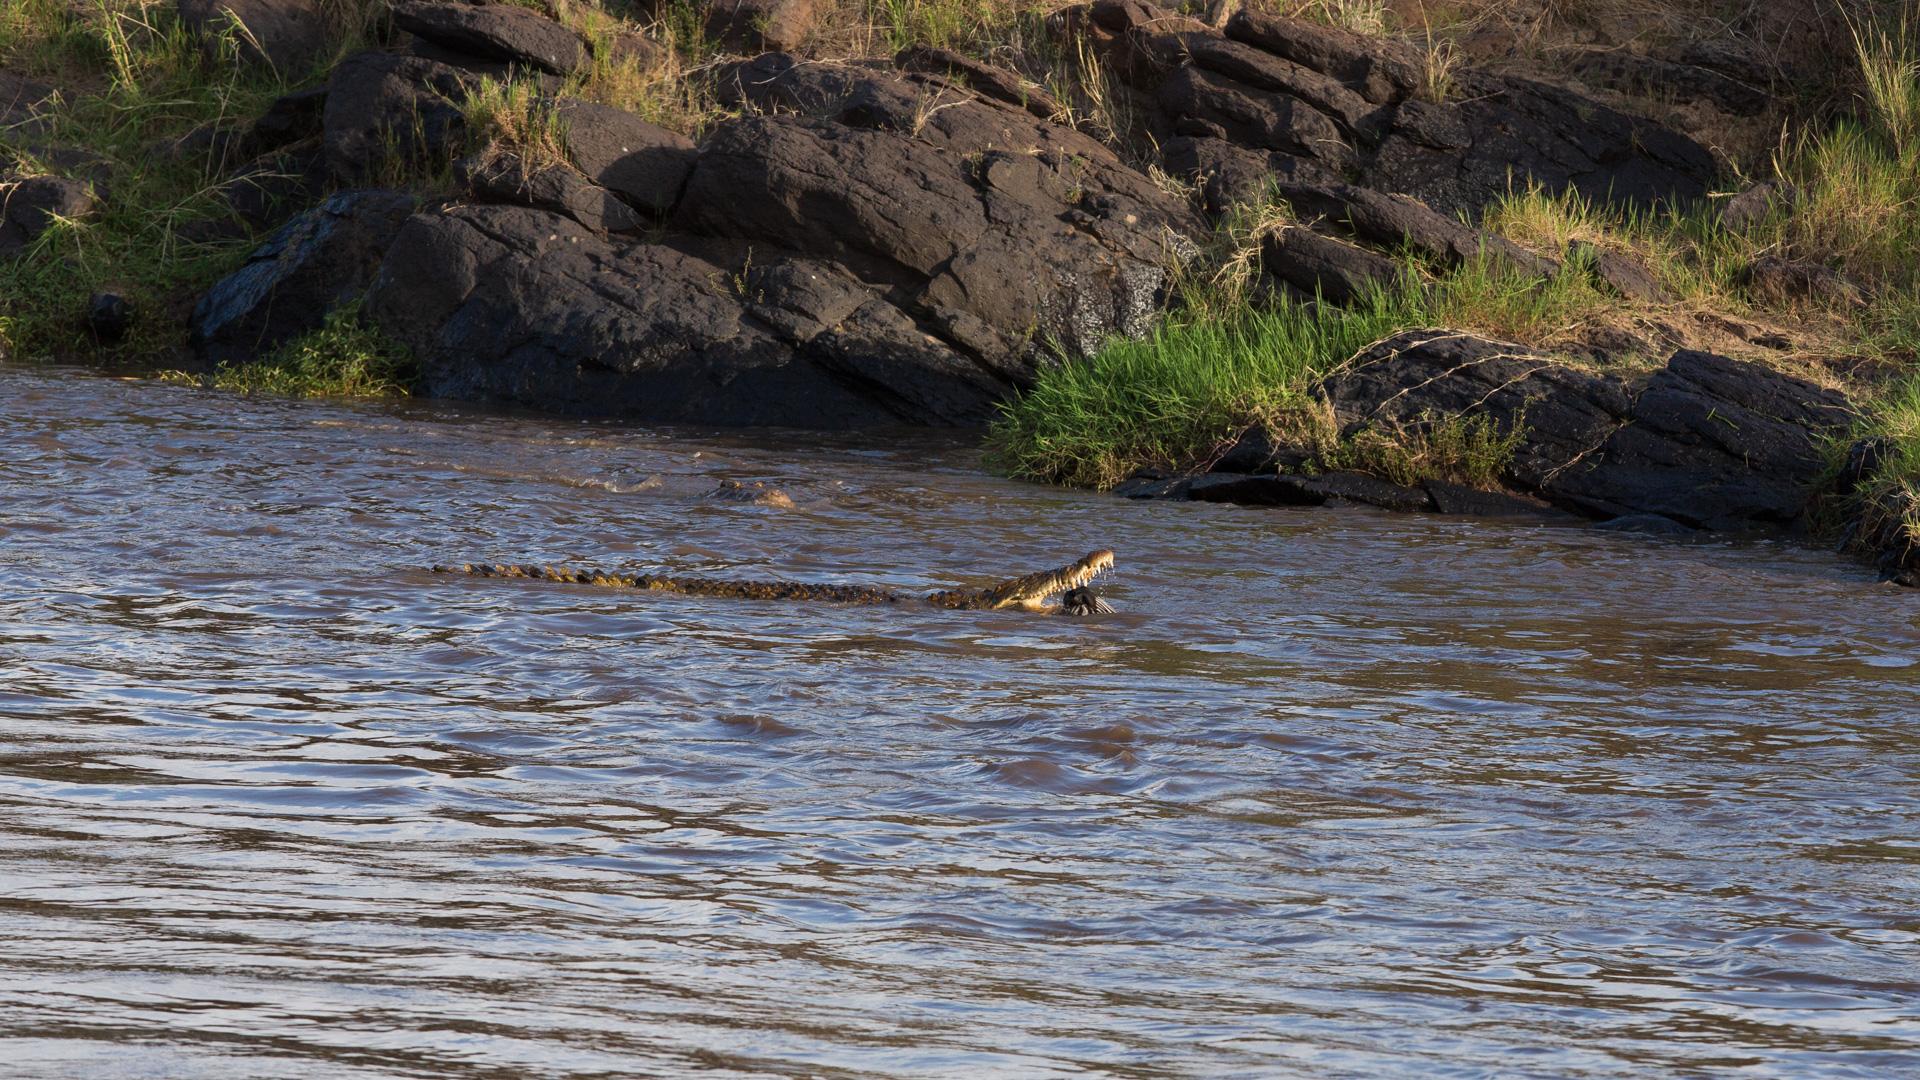 crocodile drowns zebra